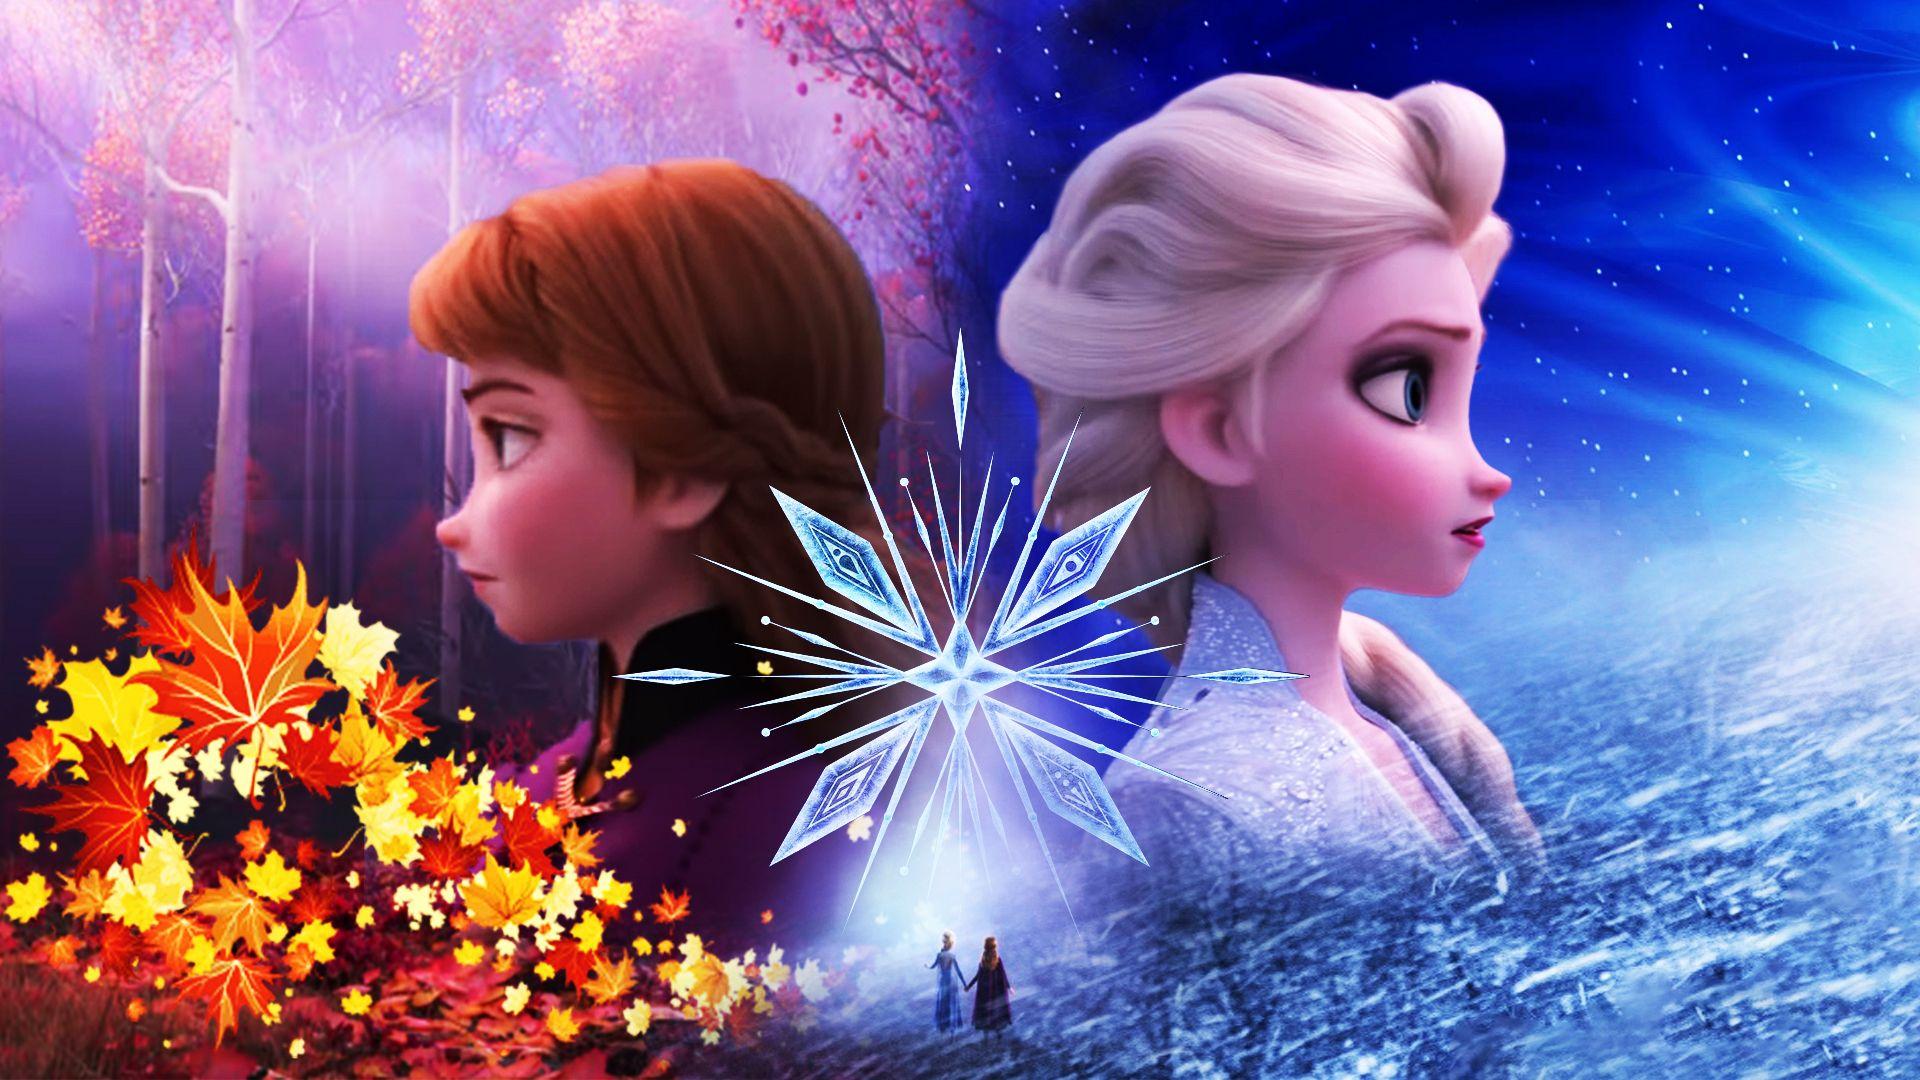 Frozen Ii Wallpaper By The Dark Mamba 995 On Deviantart Frozen Pictures Disney Frozen Elsa Art Frozen Wallpaper